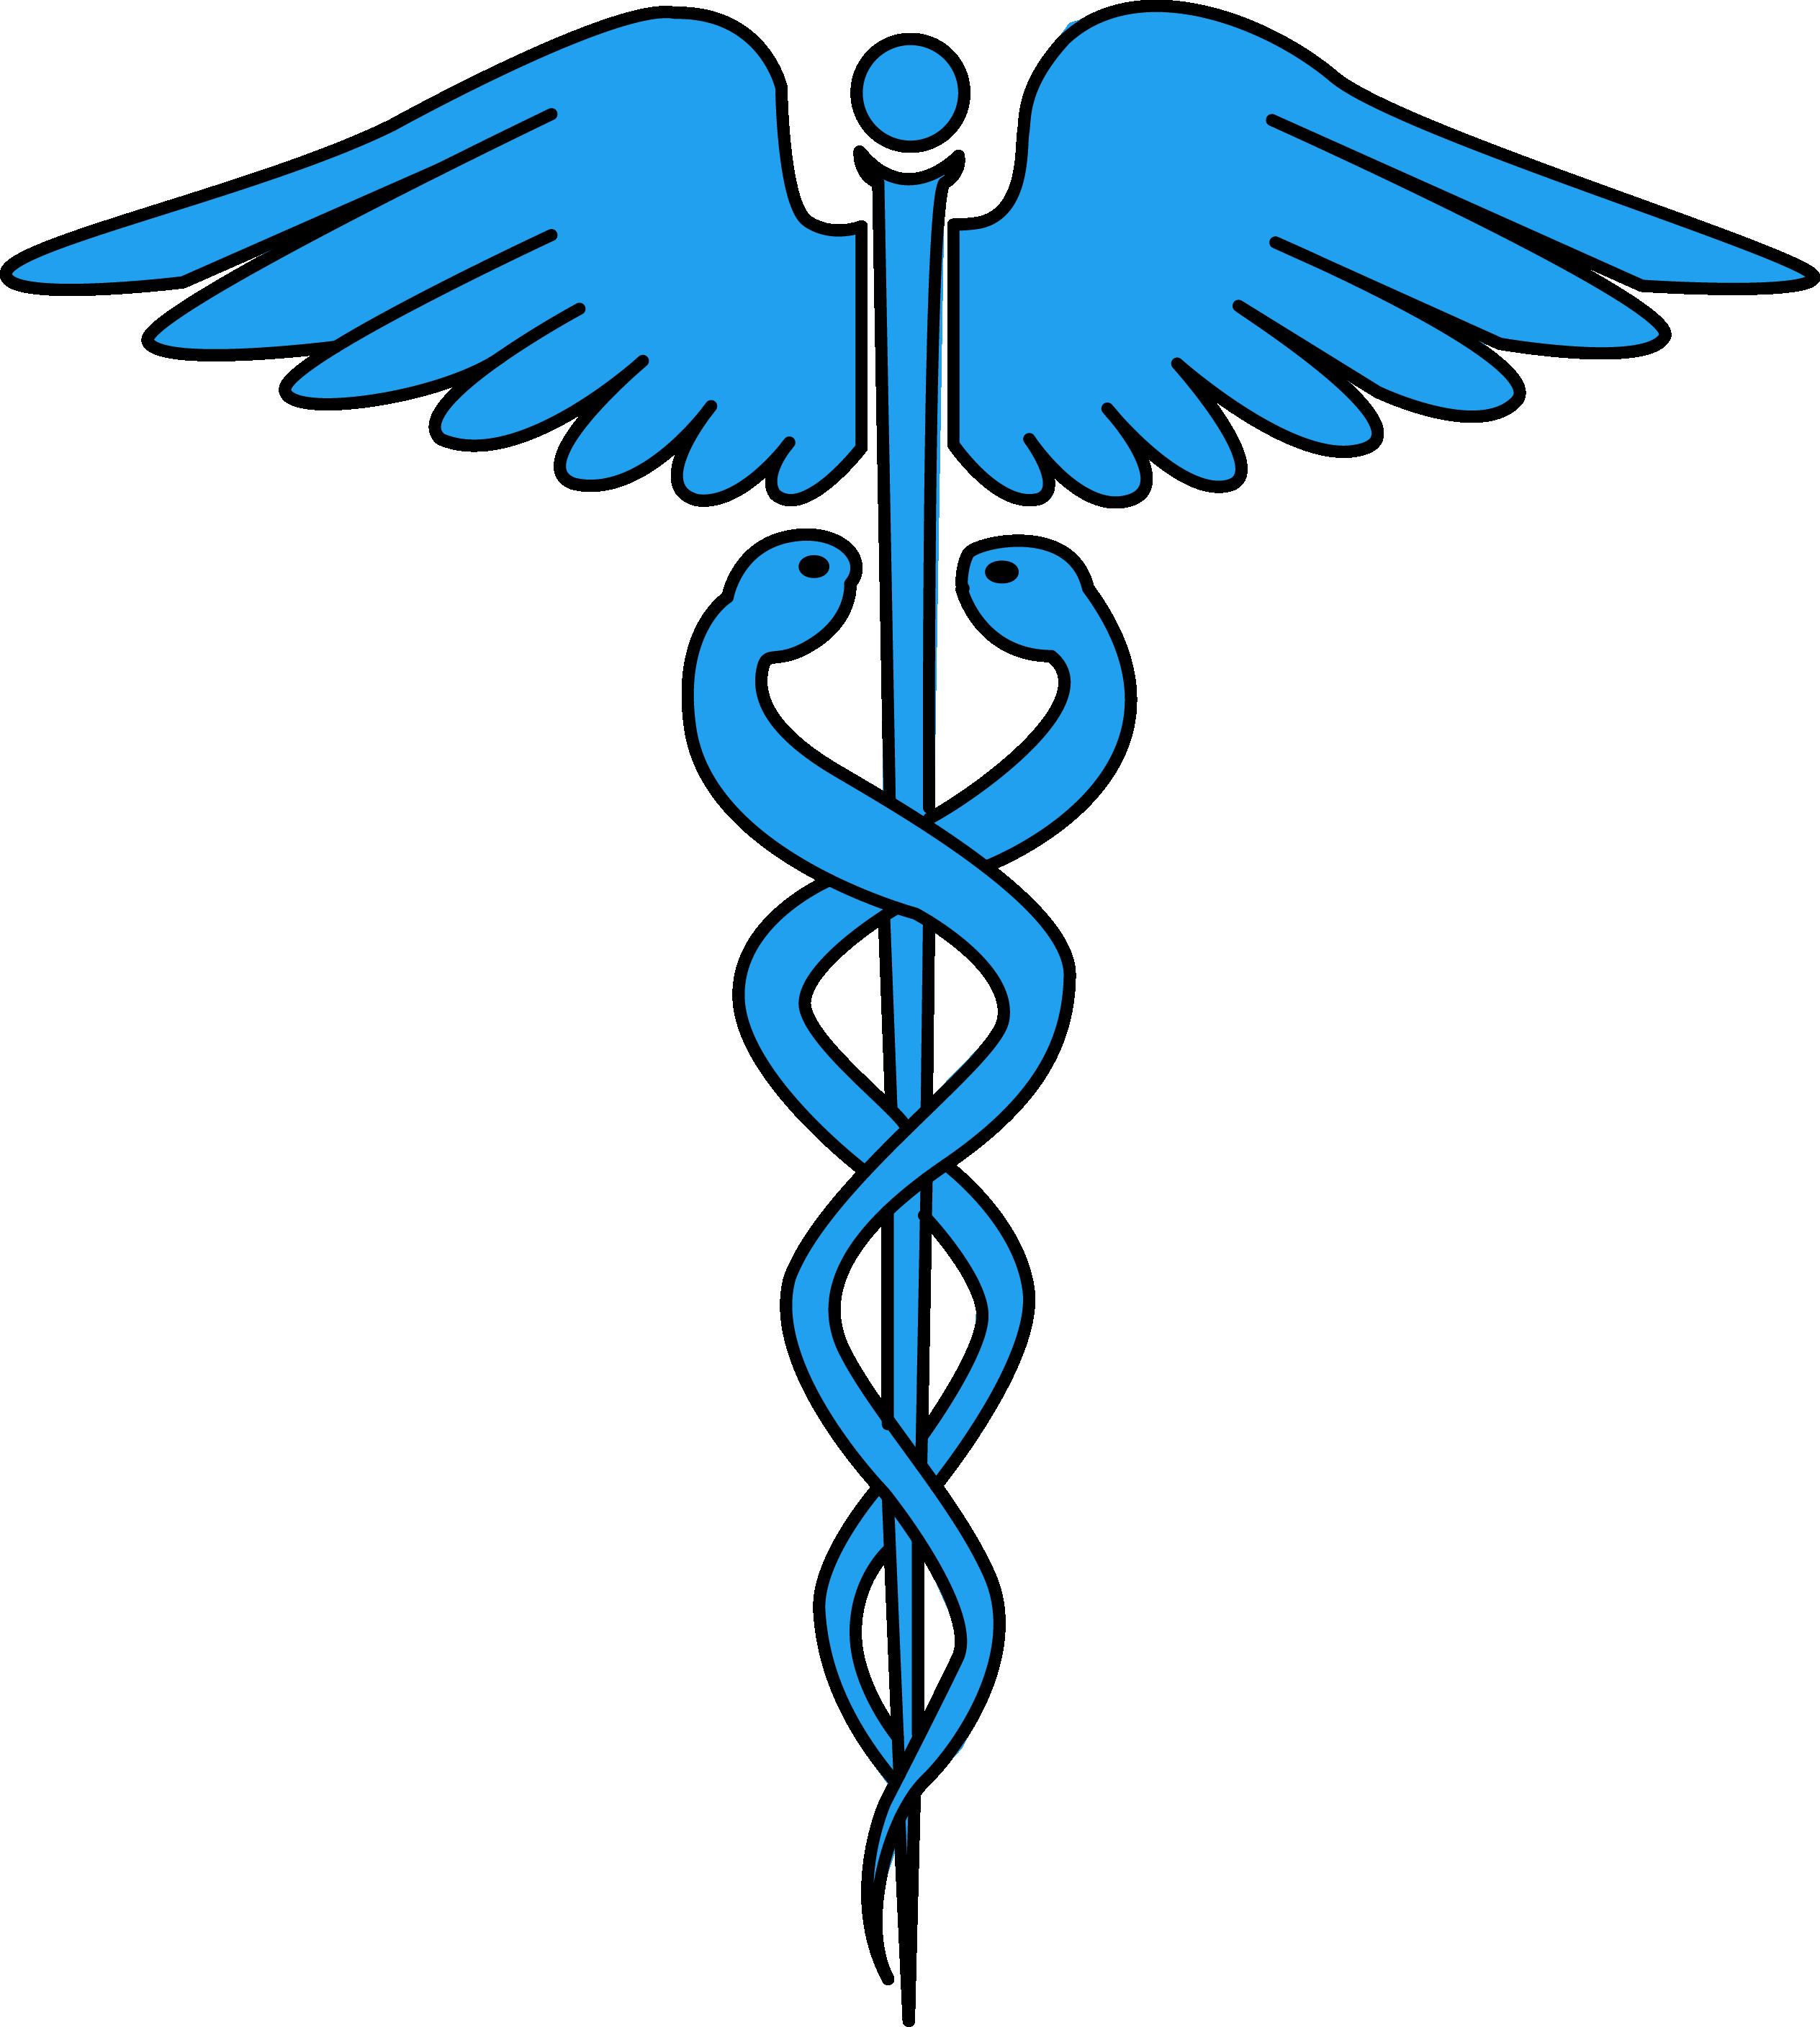 Free christian fish symbol clipart svg transparent download Medical Symbol Free - Encode clipart to Base64 svg transparent download